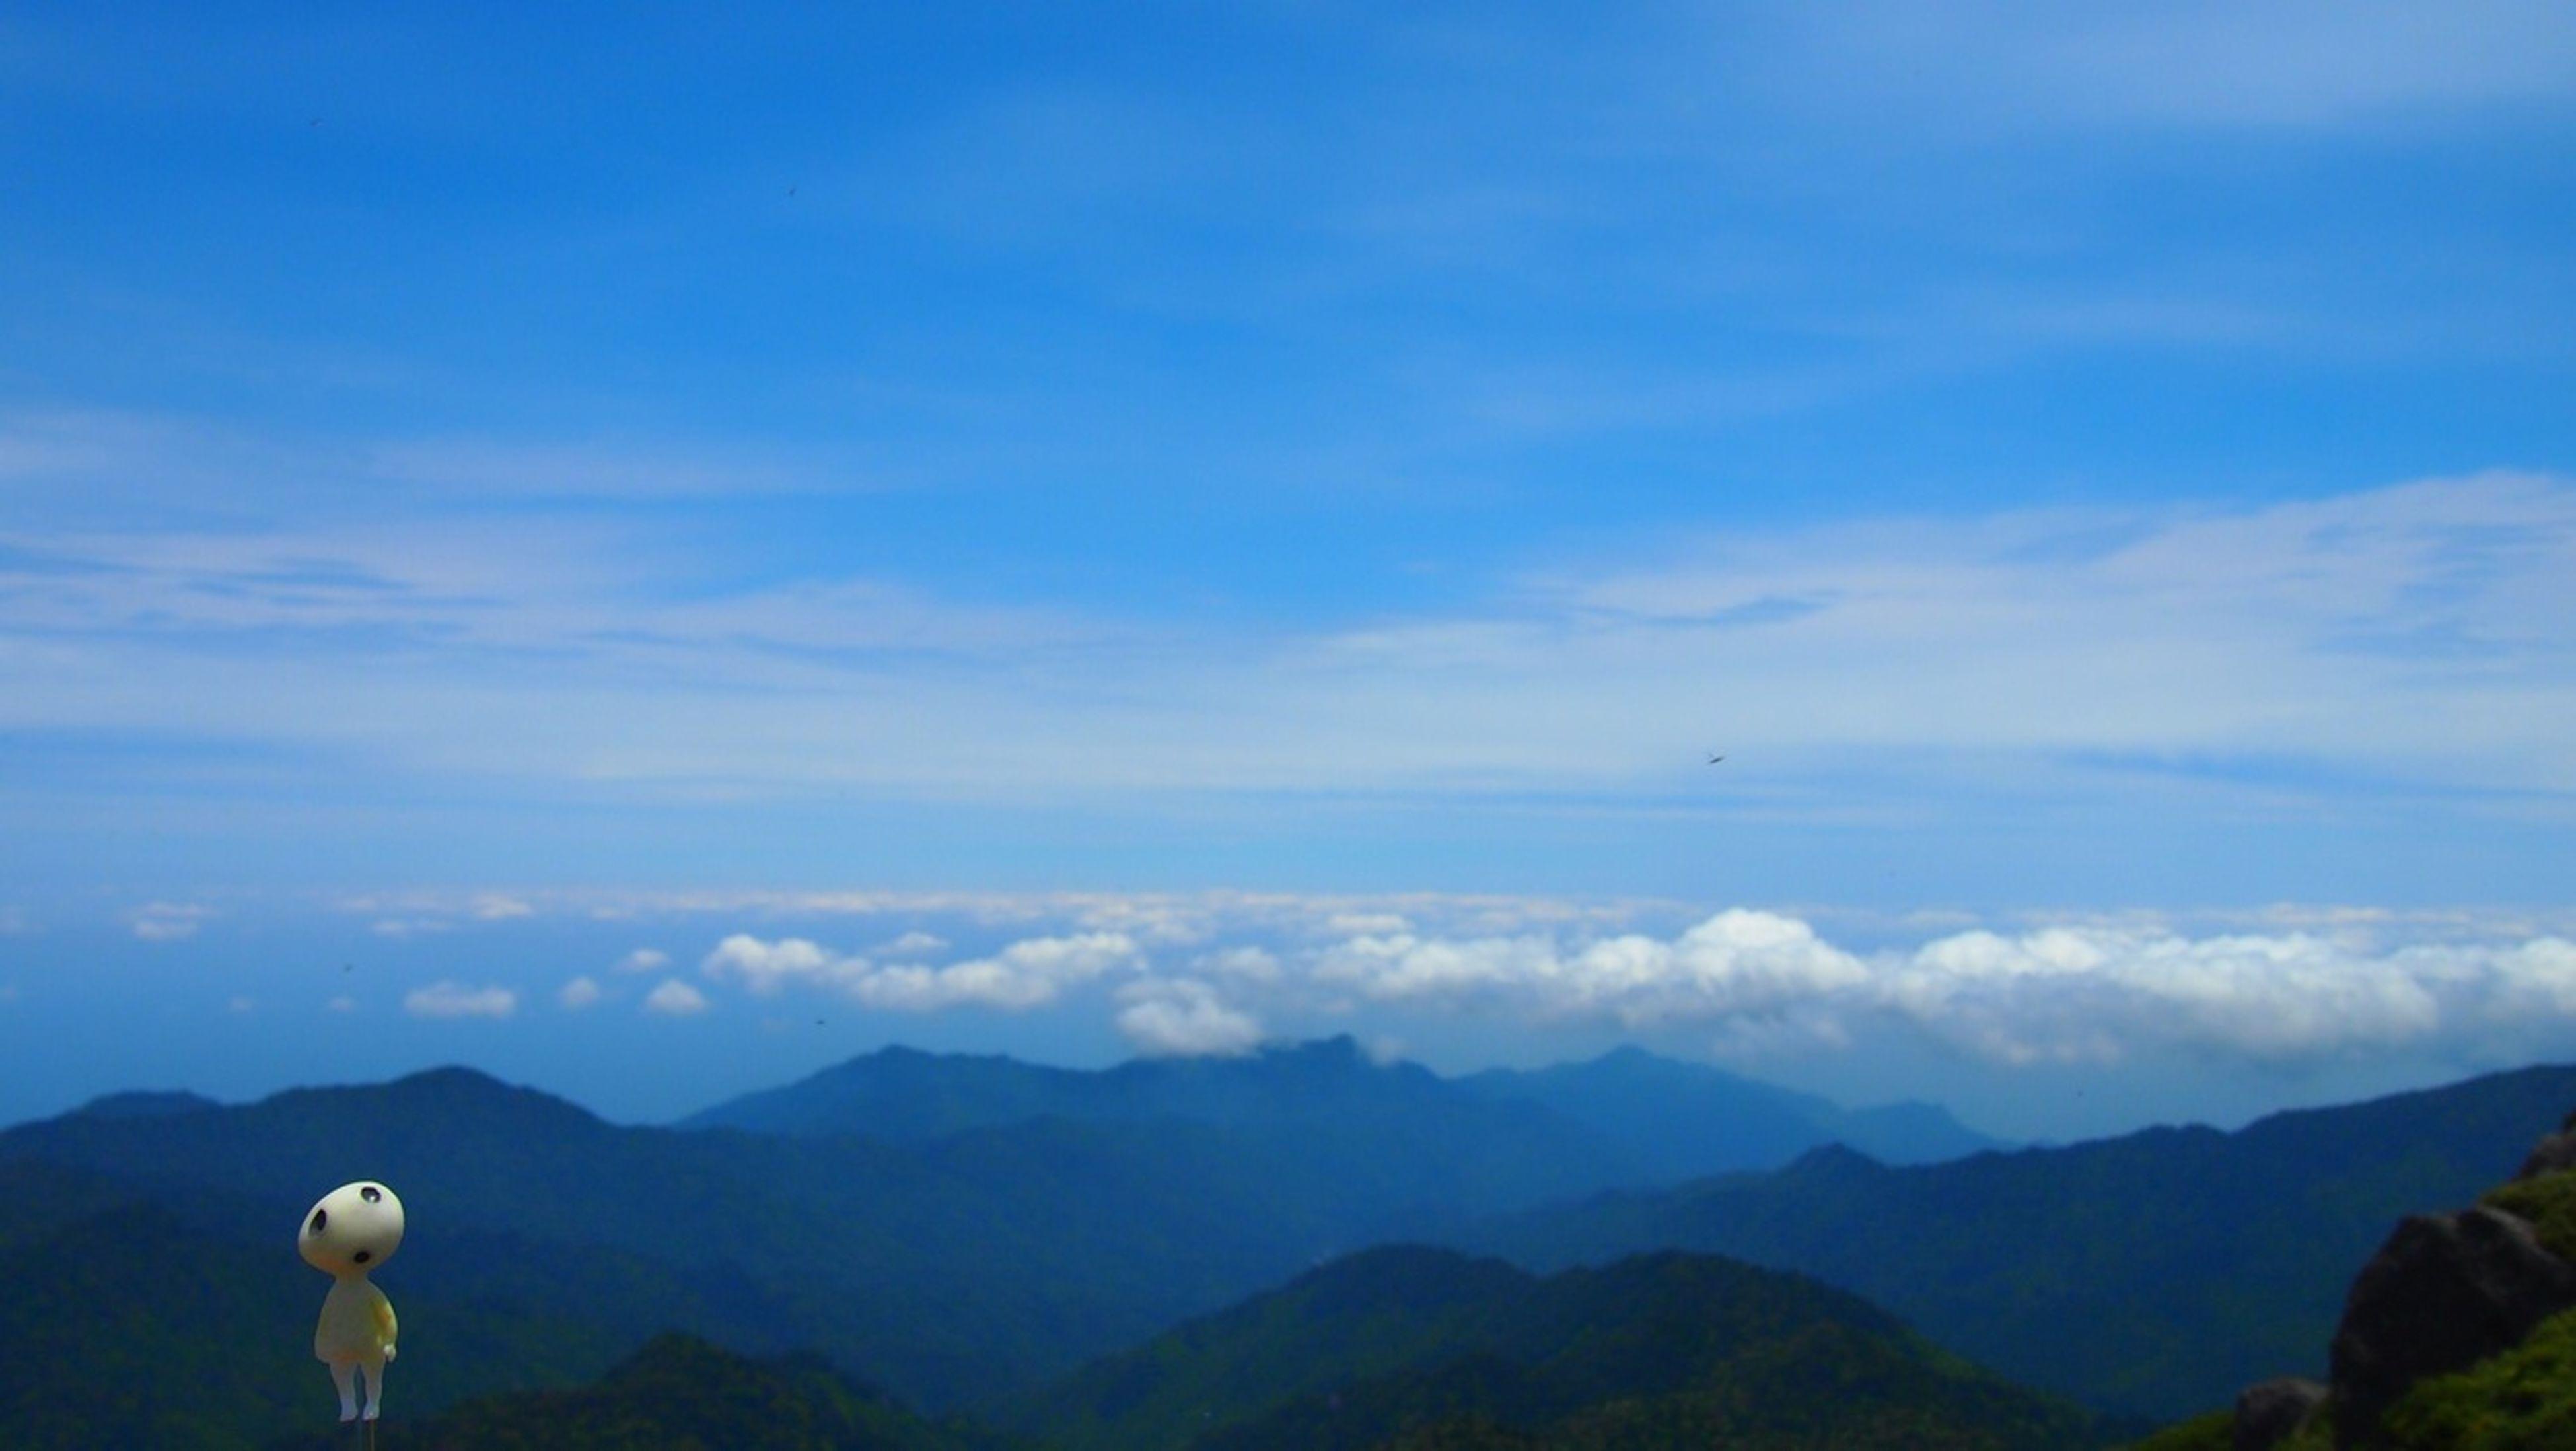 mountain, mountain range, tranquil scene, scenics, tranquility, beauty in nature, sky, landscape, nature, idyllic, blue, cloud - sky, silhouette, cloud, non-urban scene, remote, copy space, outdoors, hill, non urban scene